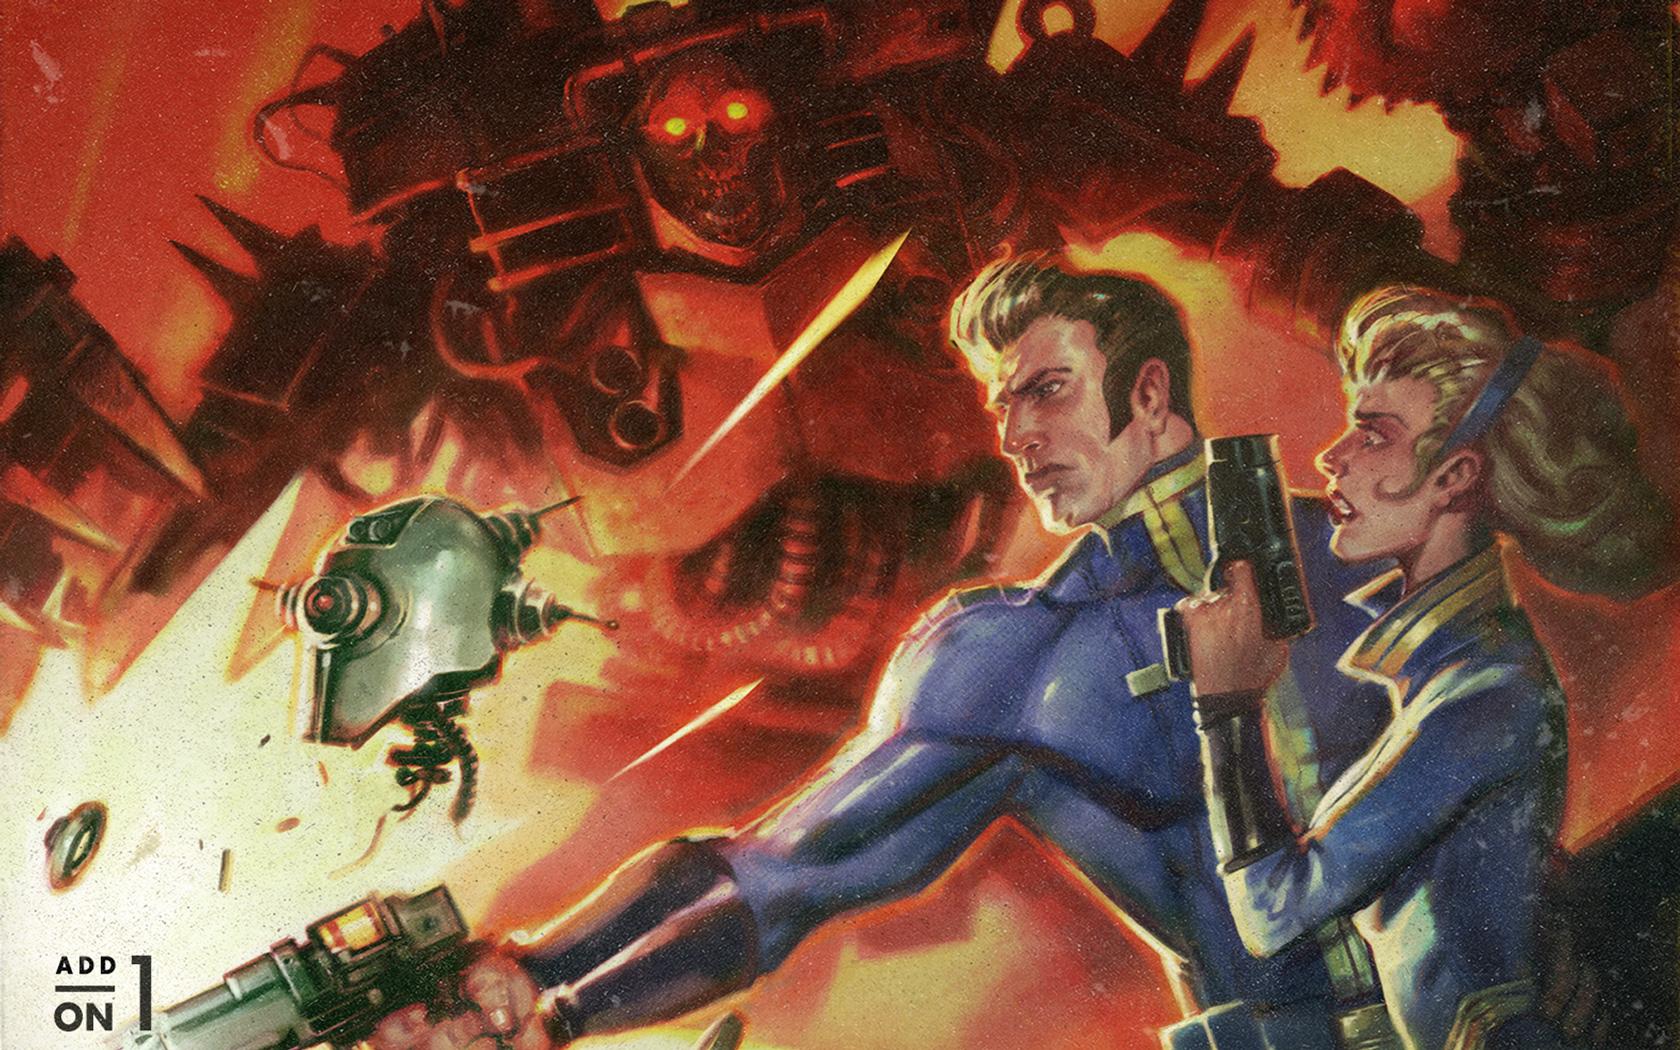 Fallout 4 Wallpaper in 1680x1050